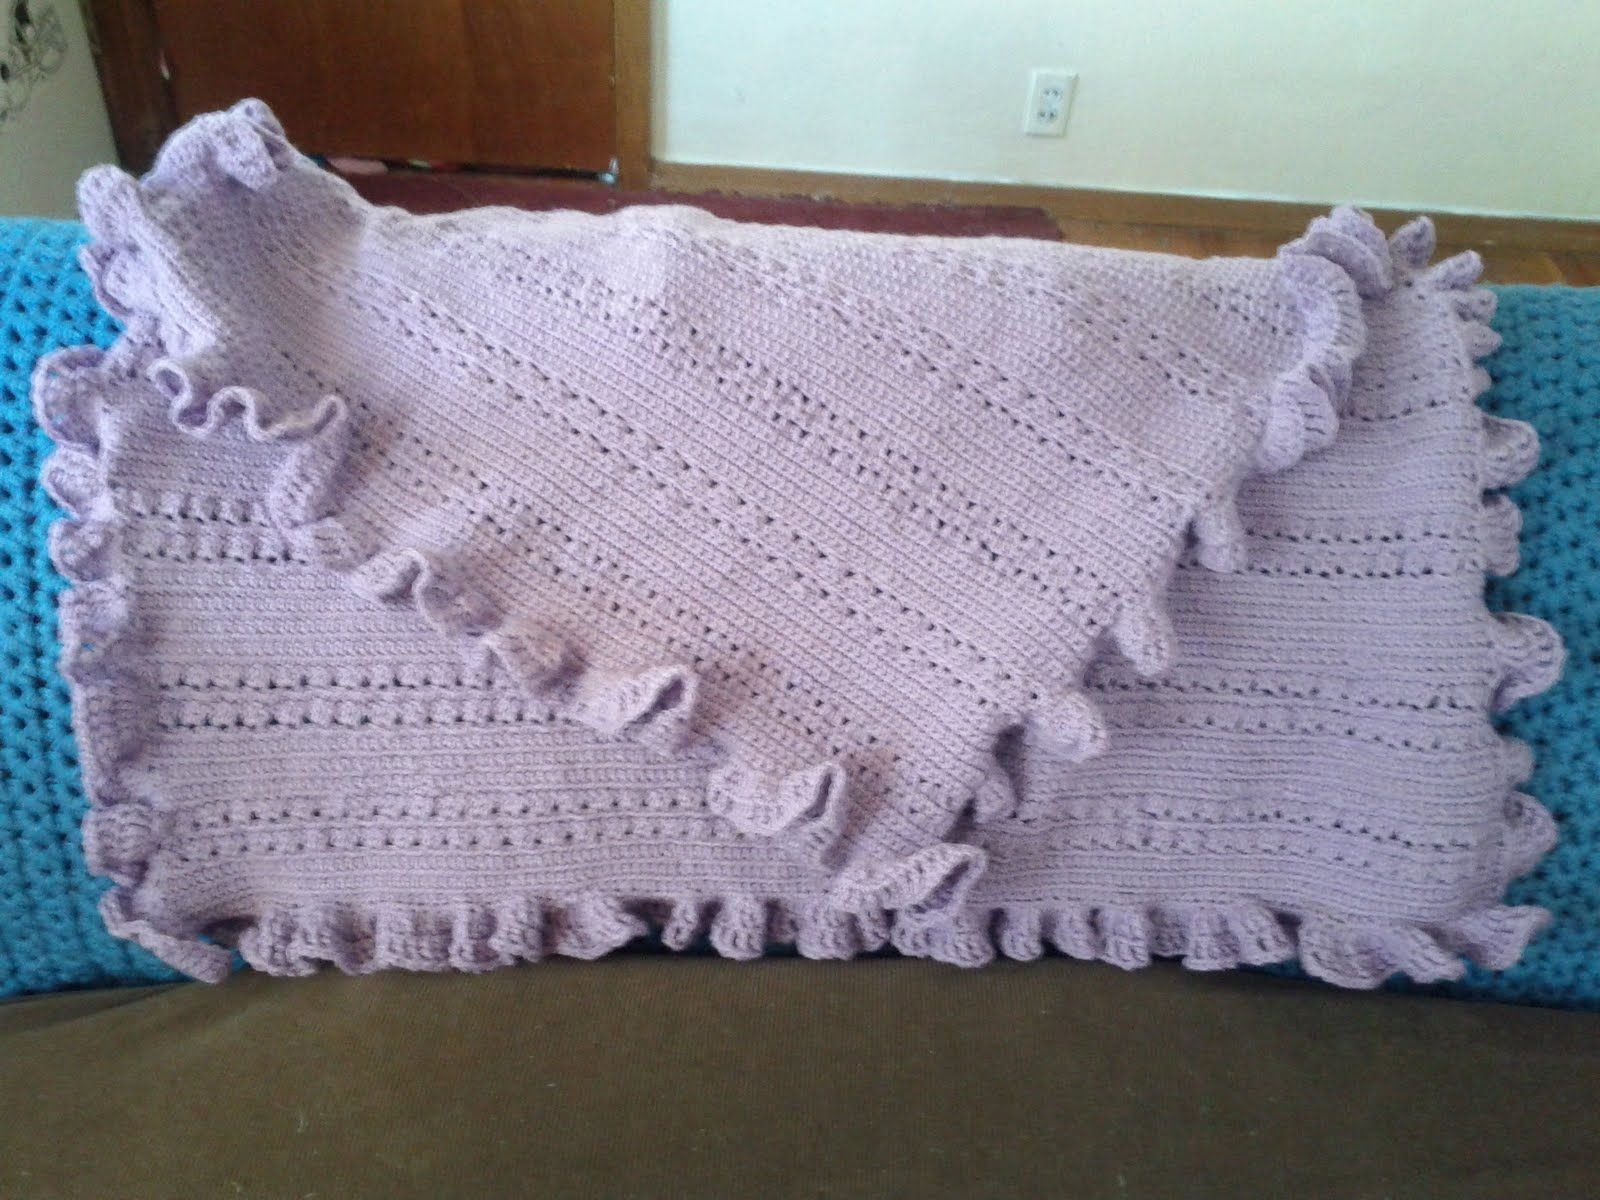 Crochet+Ruffle+Edging+Pattern | crochet ruffle edging patterns ...